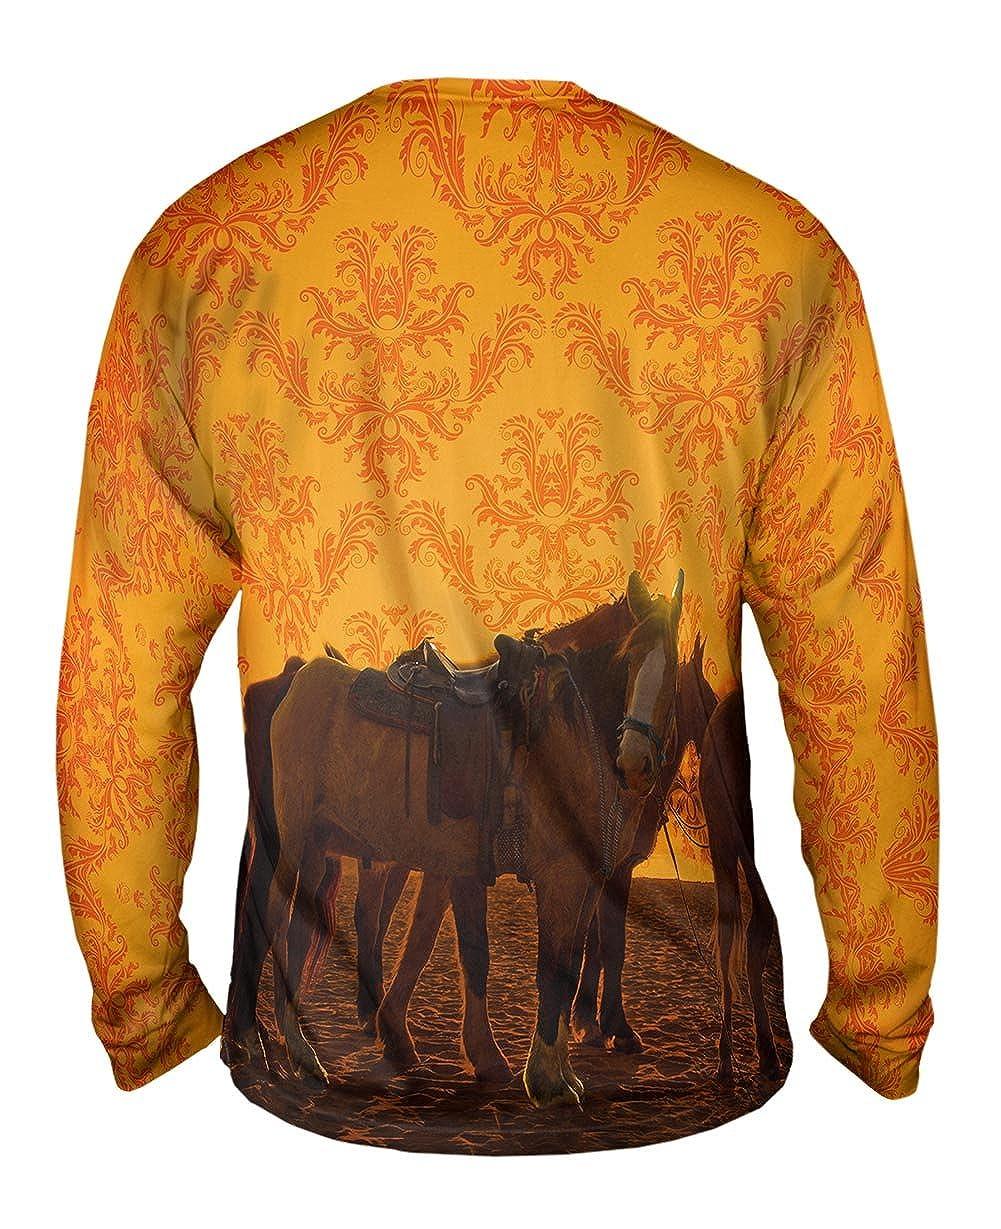 Sand Horse TShirt Yizzam Mens Long Sleeve